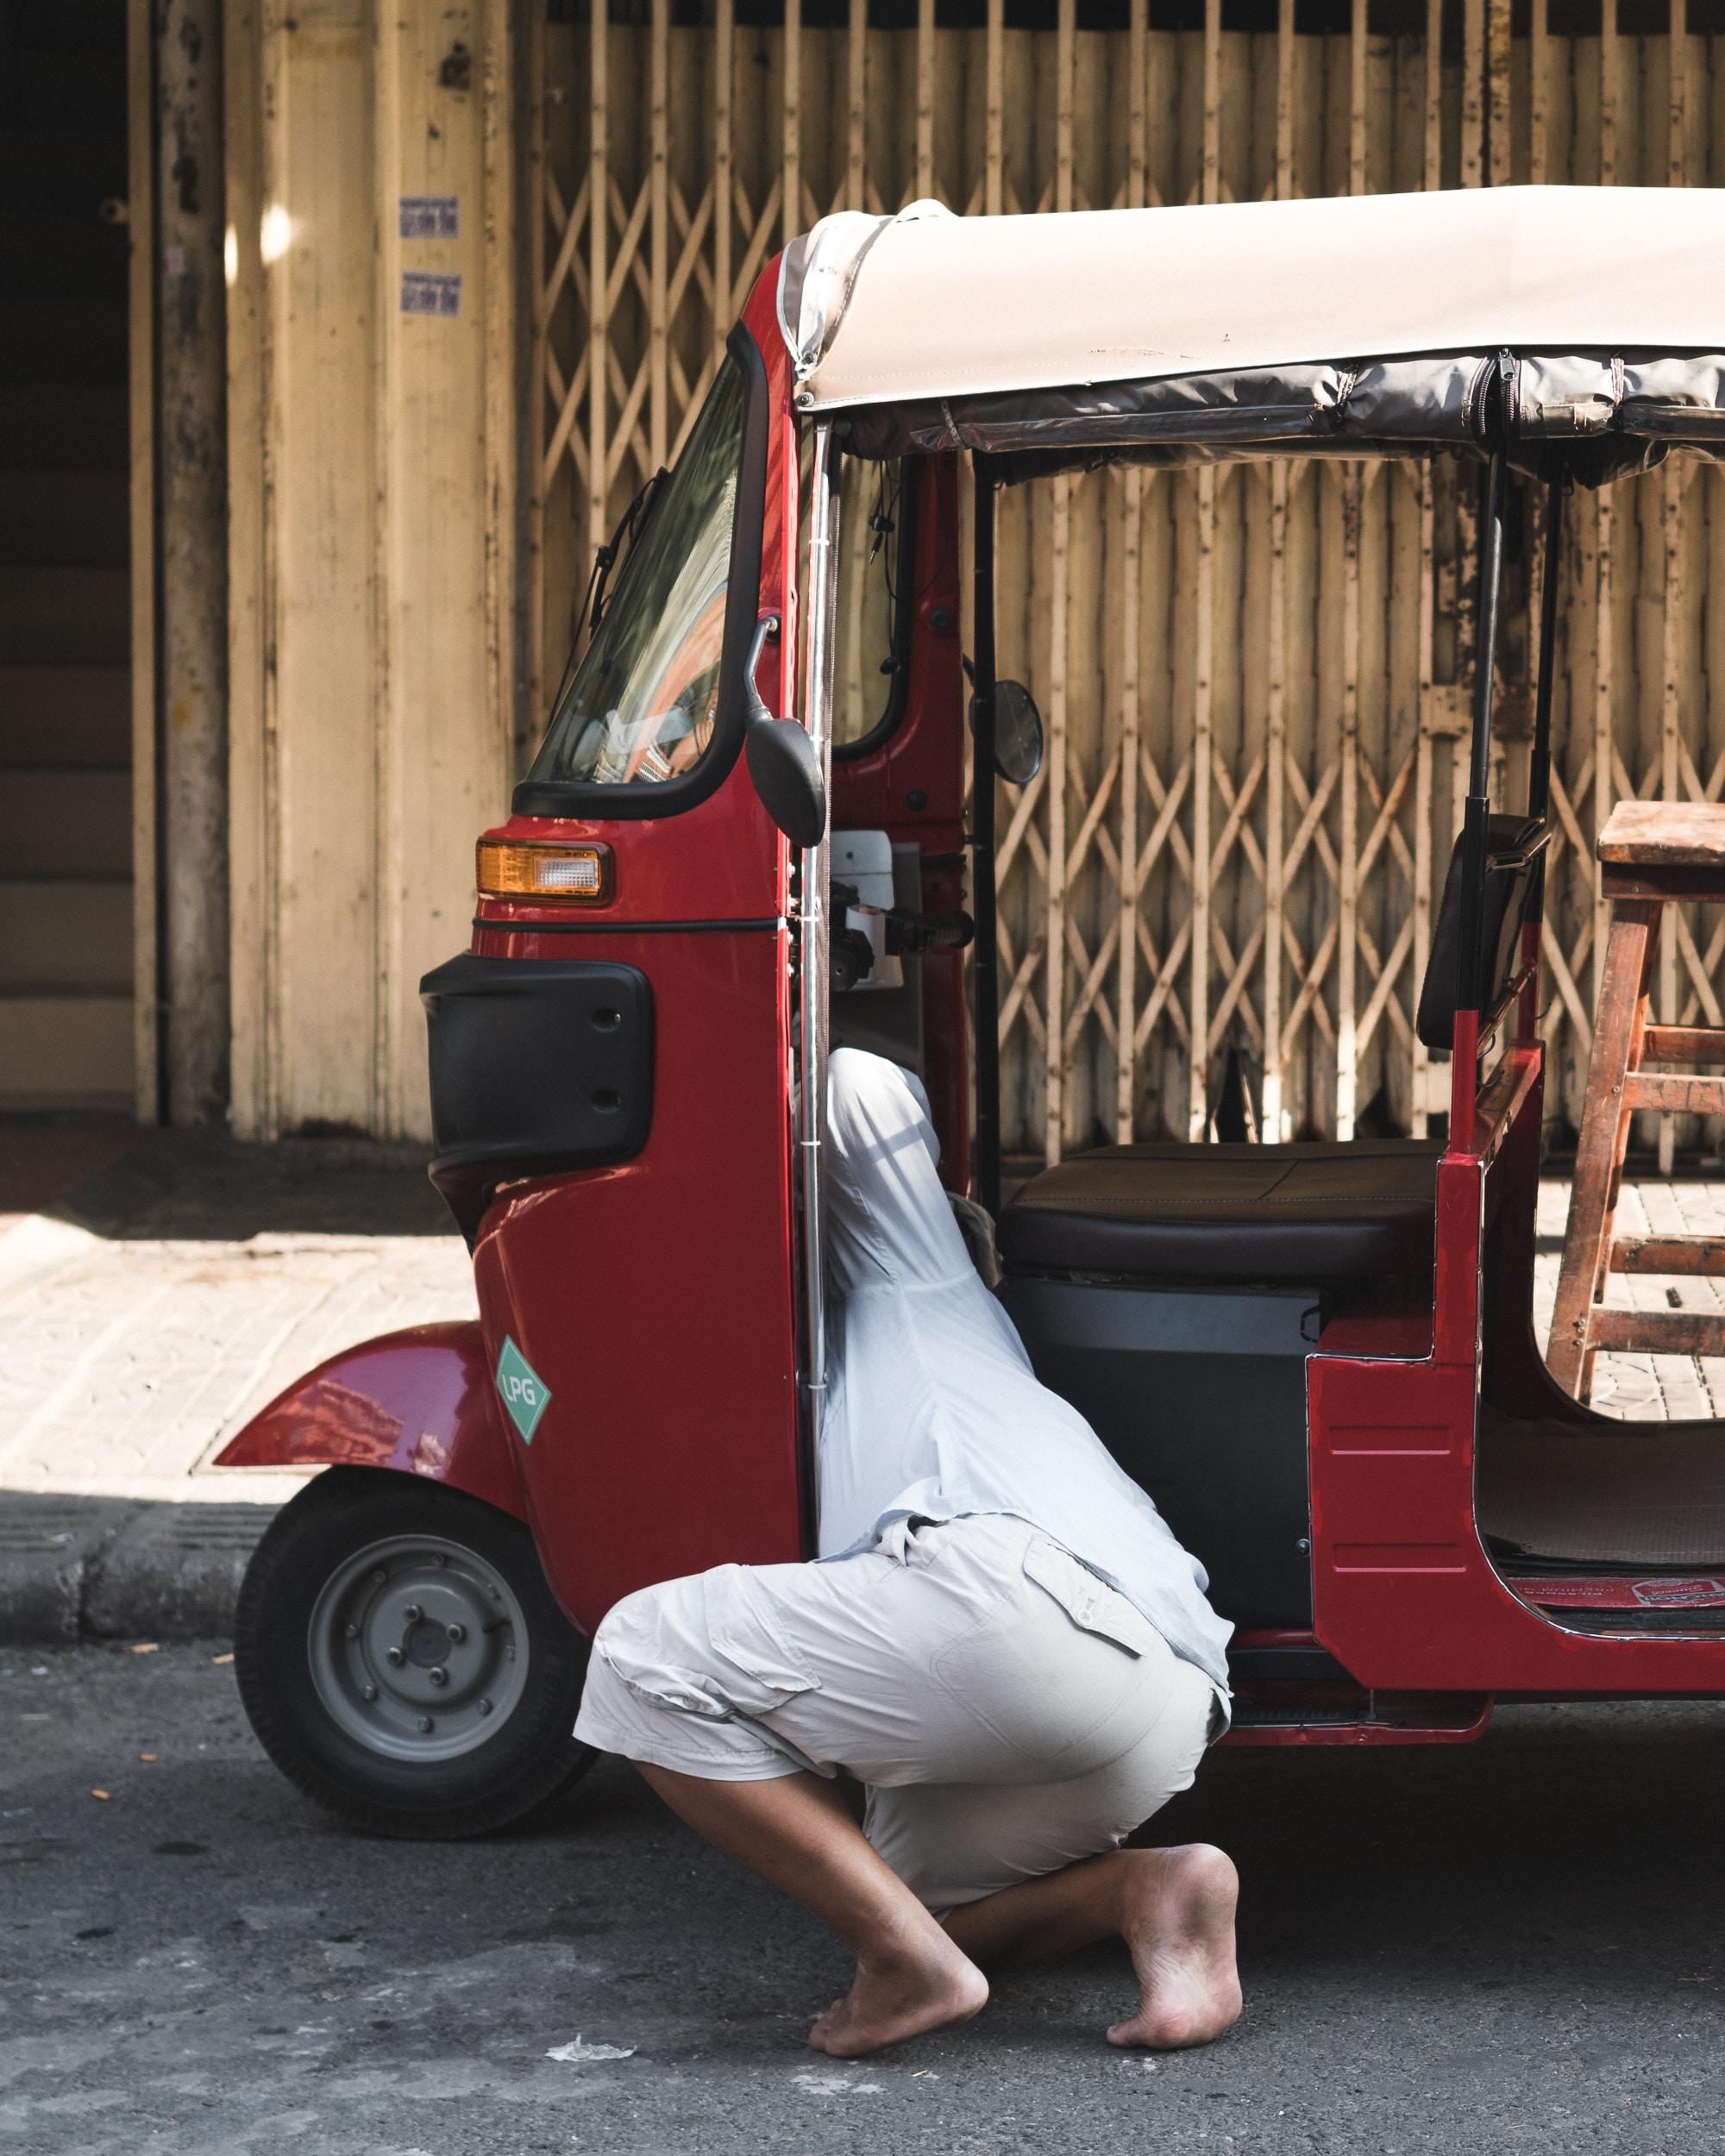 person kneeling in side cart